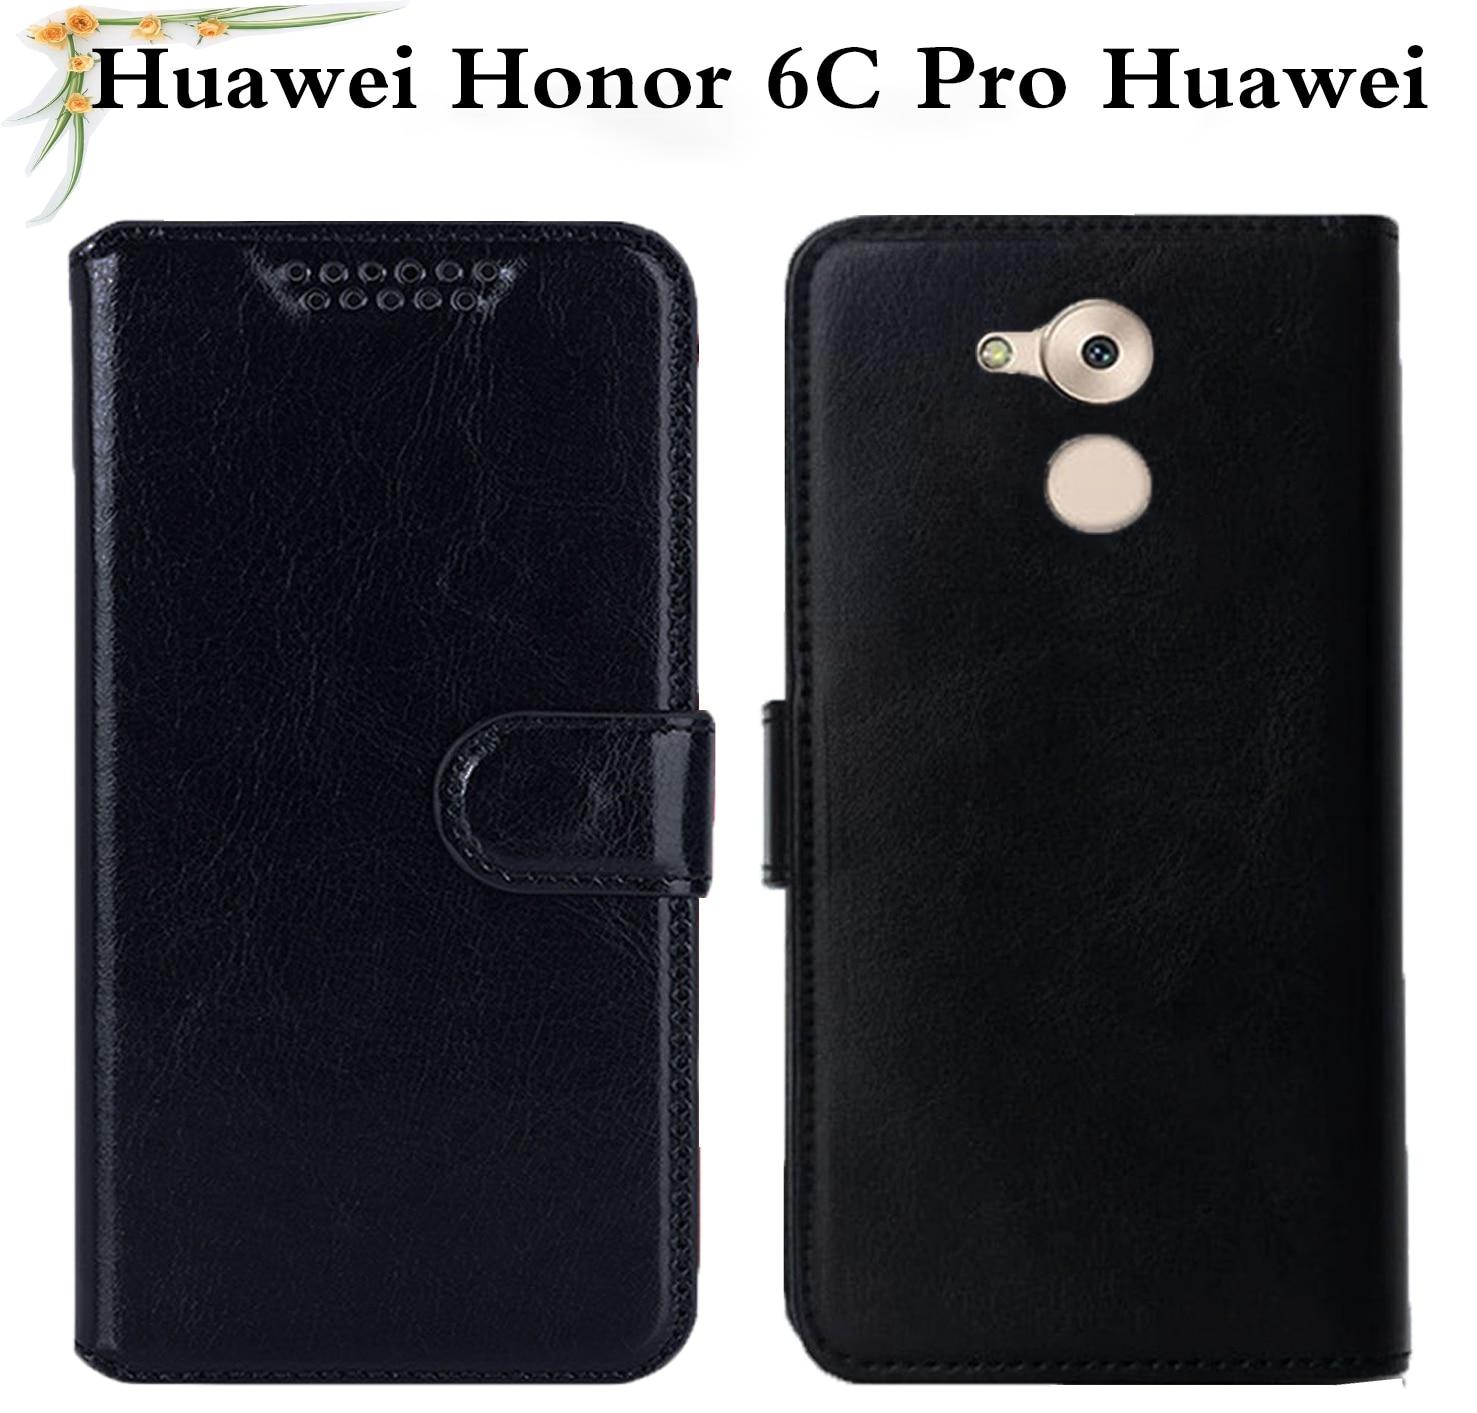 Funda abatible de lujo para Huawei Honor 6C Pro Huawei JMM-L22 de cuero PU funda de silicona suave 6C 6 C Pro JMM-L22 5,2 funda